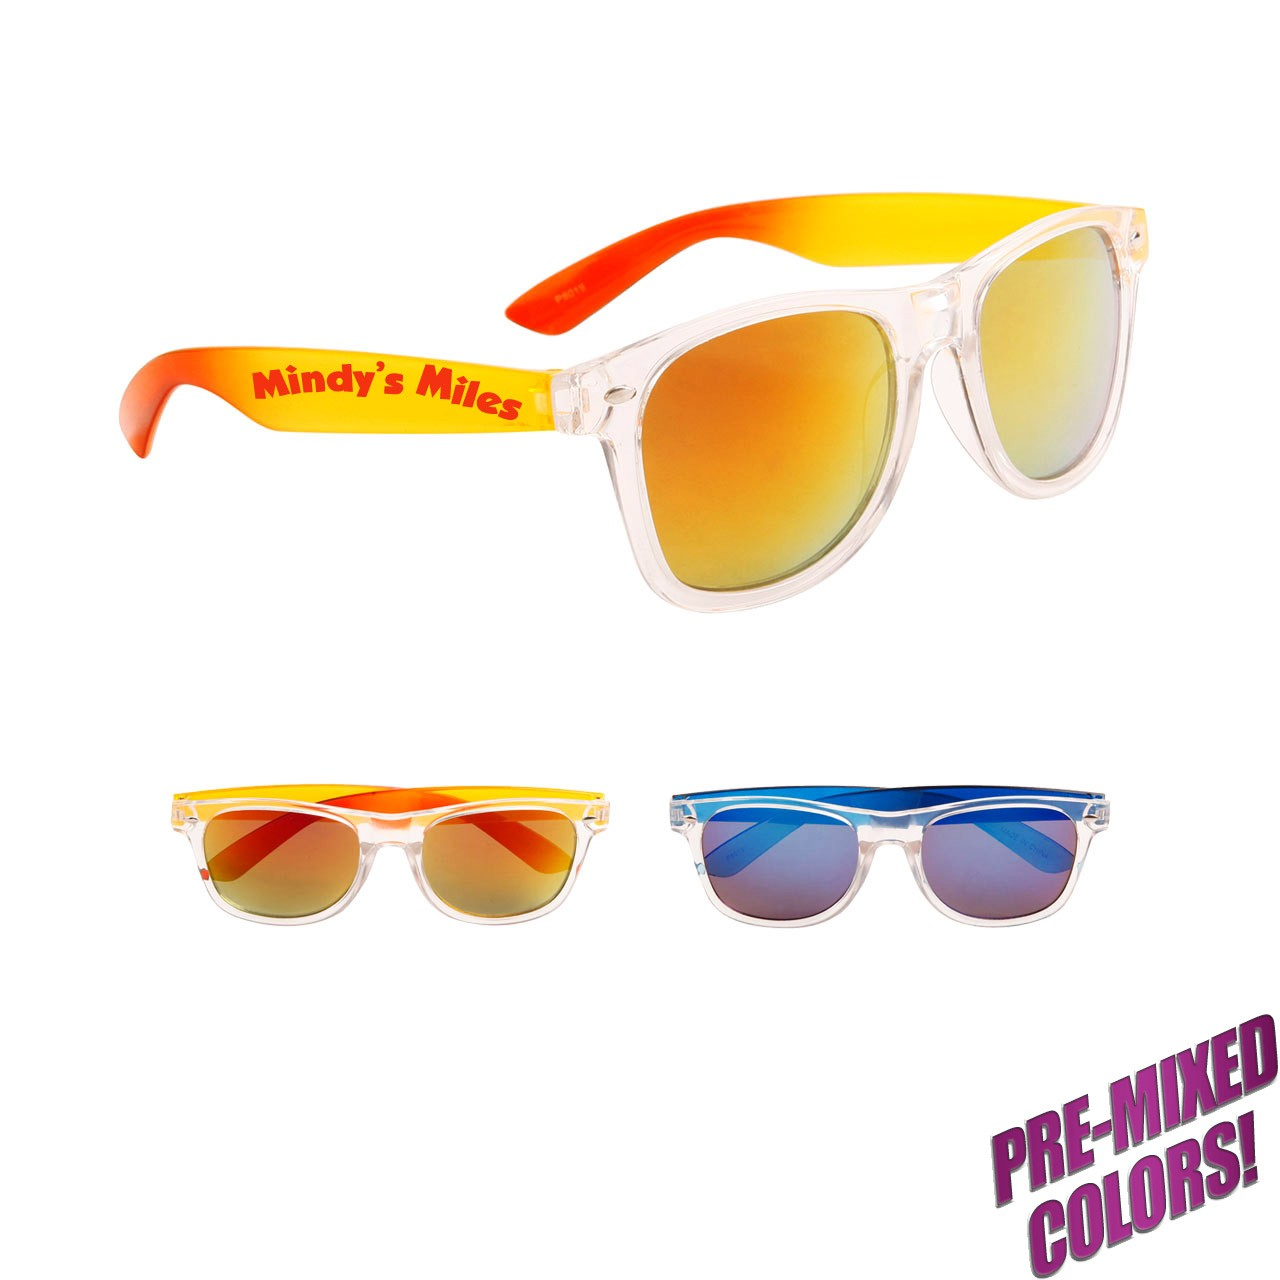 Promotional Acapulco Sunglasses